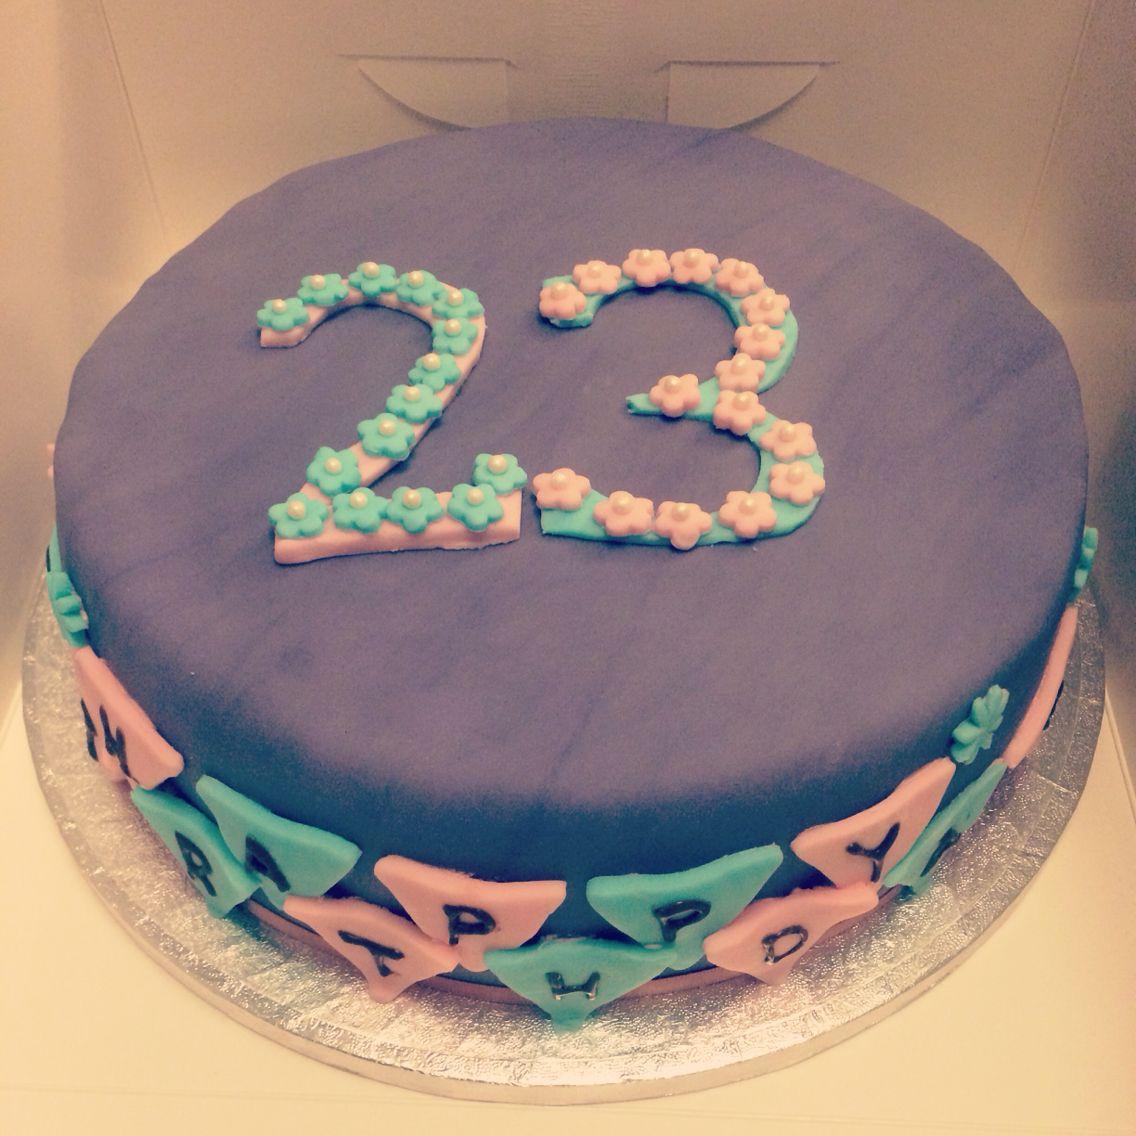 23rd birthday cake 23rd birthday cake women girl